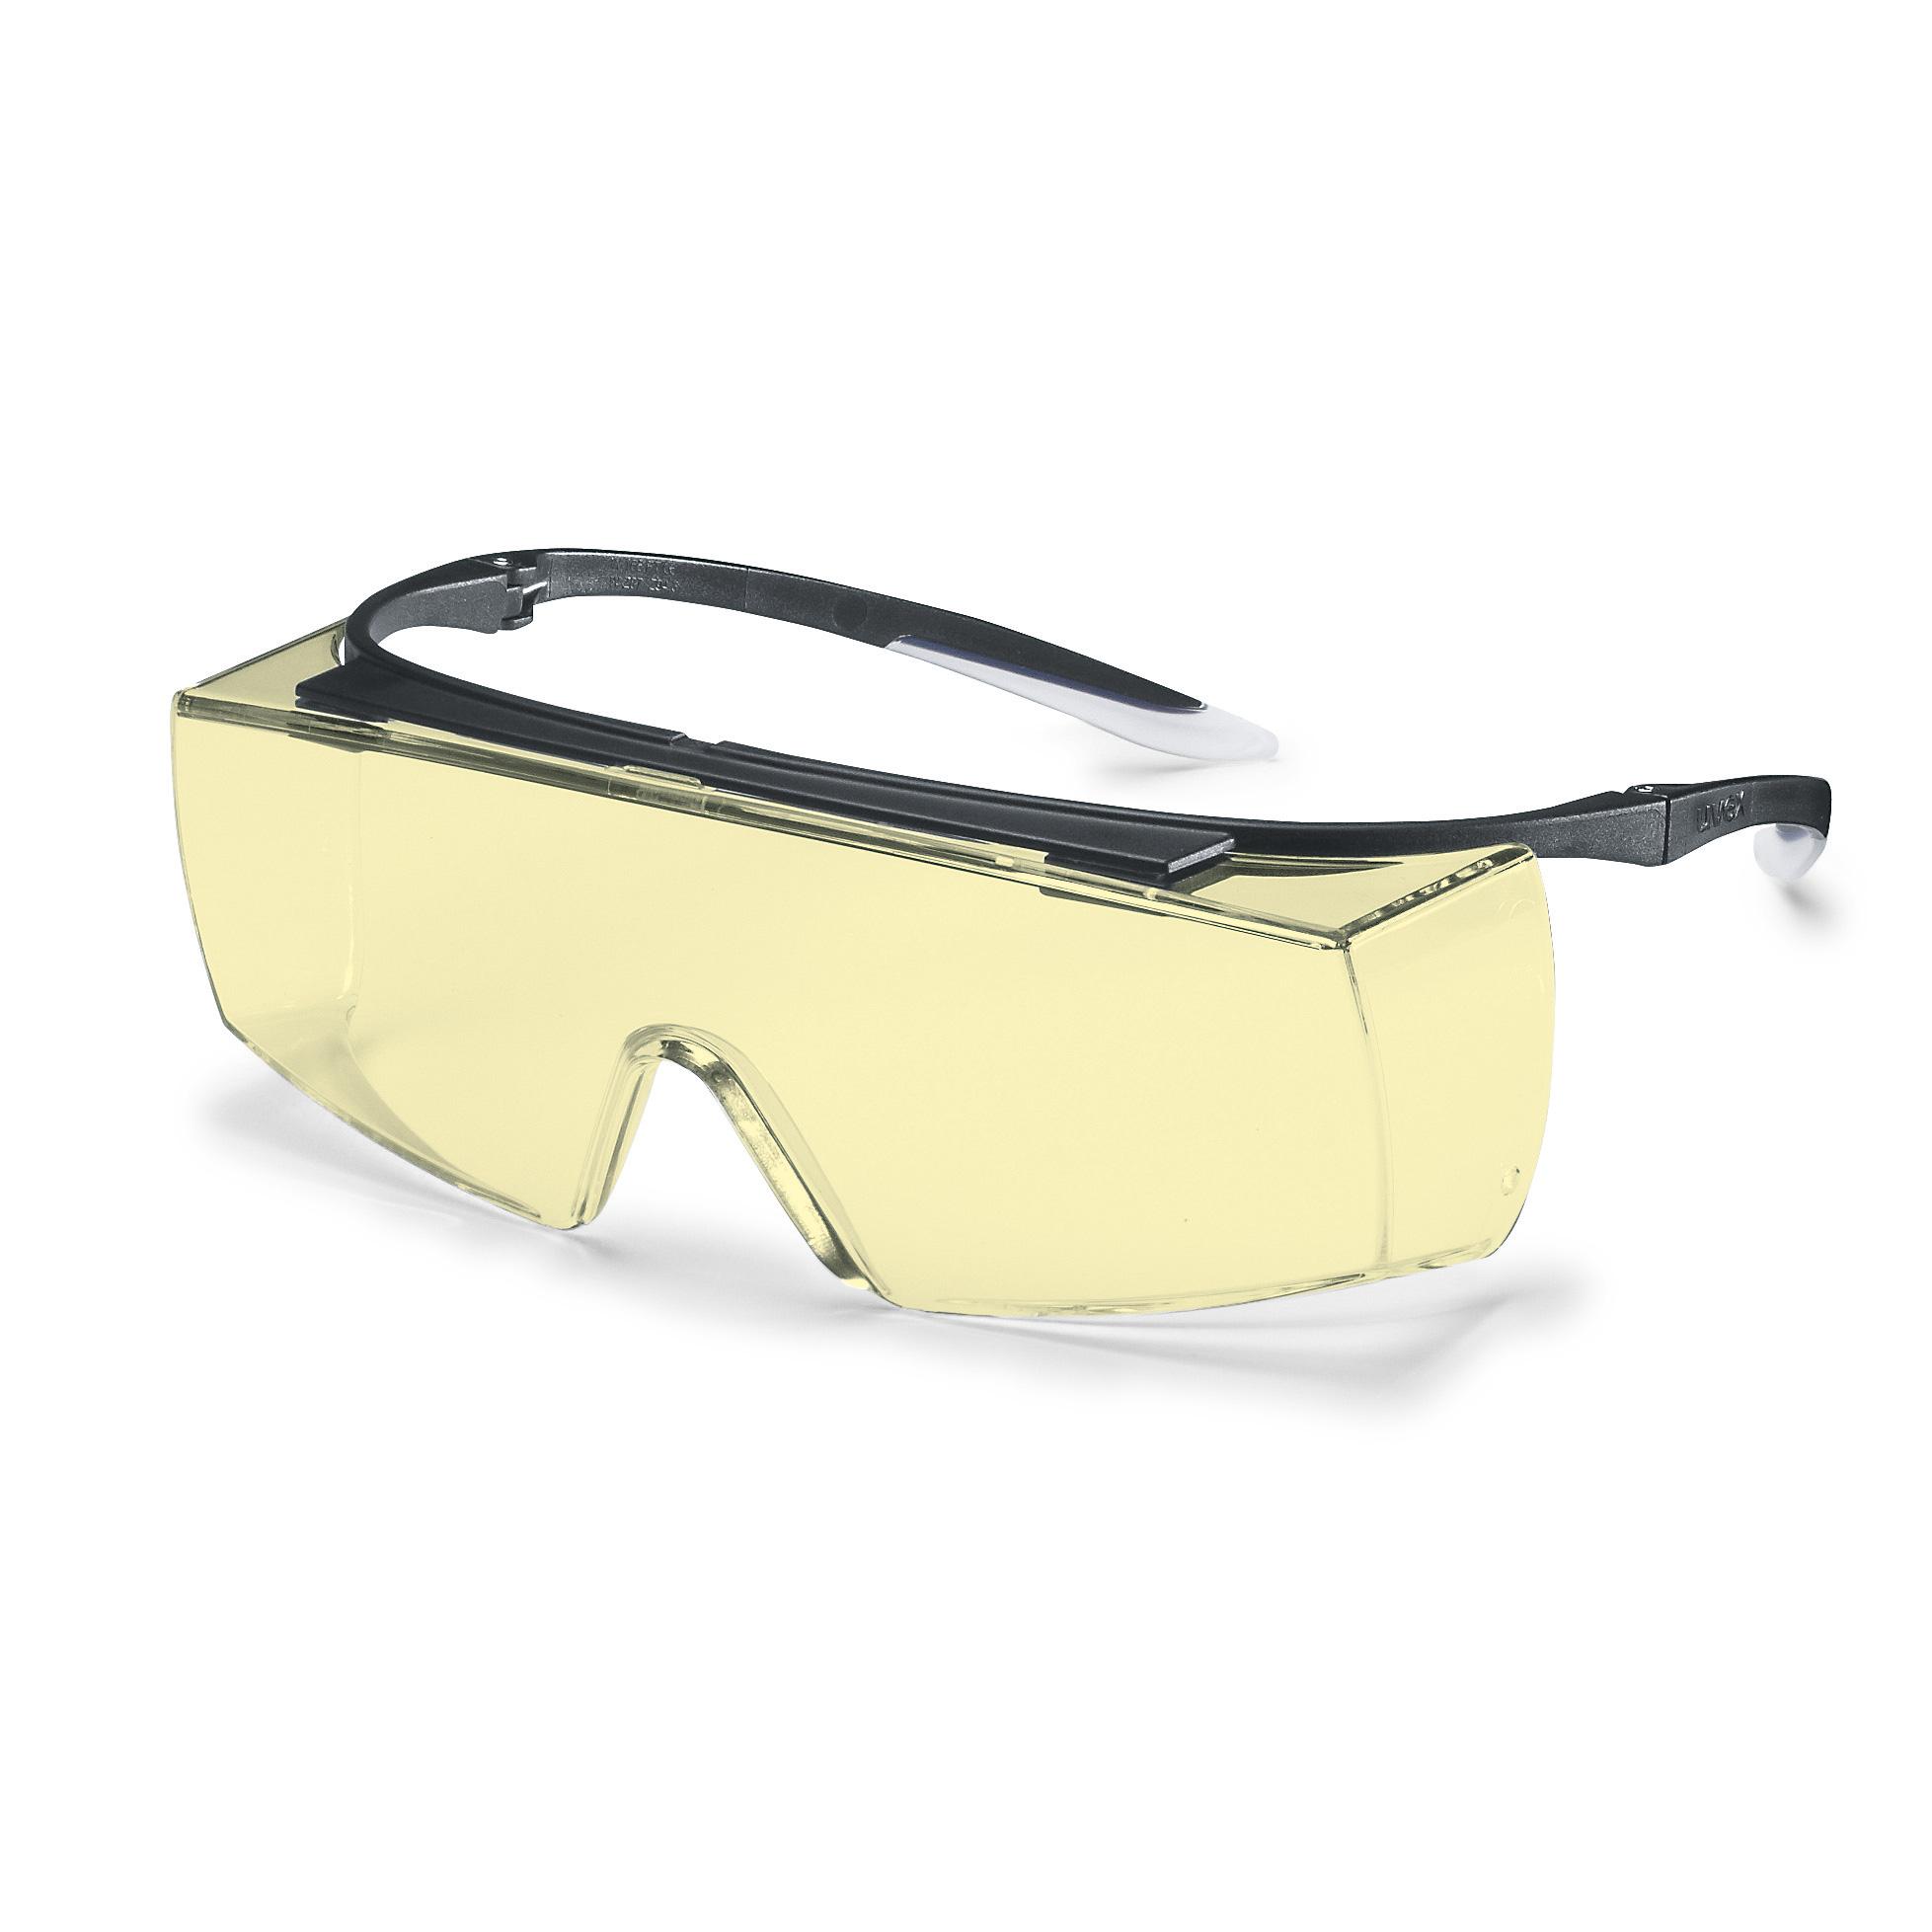 Lunettes à branches uvex super f OTG   Protection des yeux   uvex safety 8ff71c06a4d3